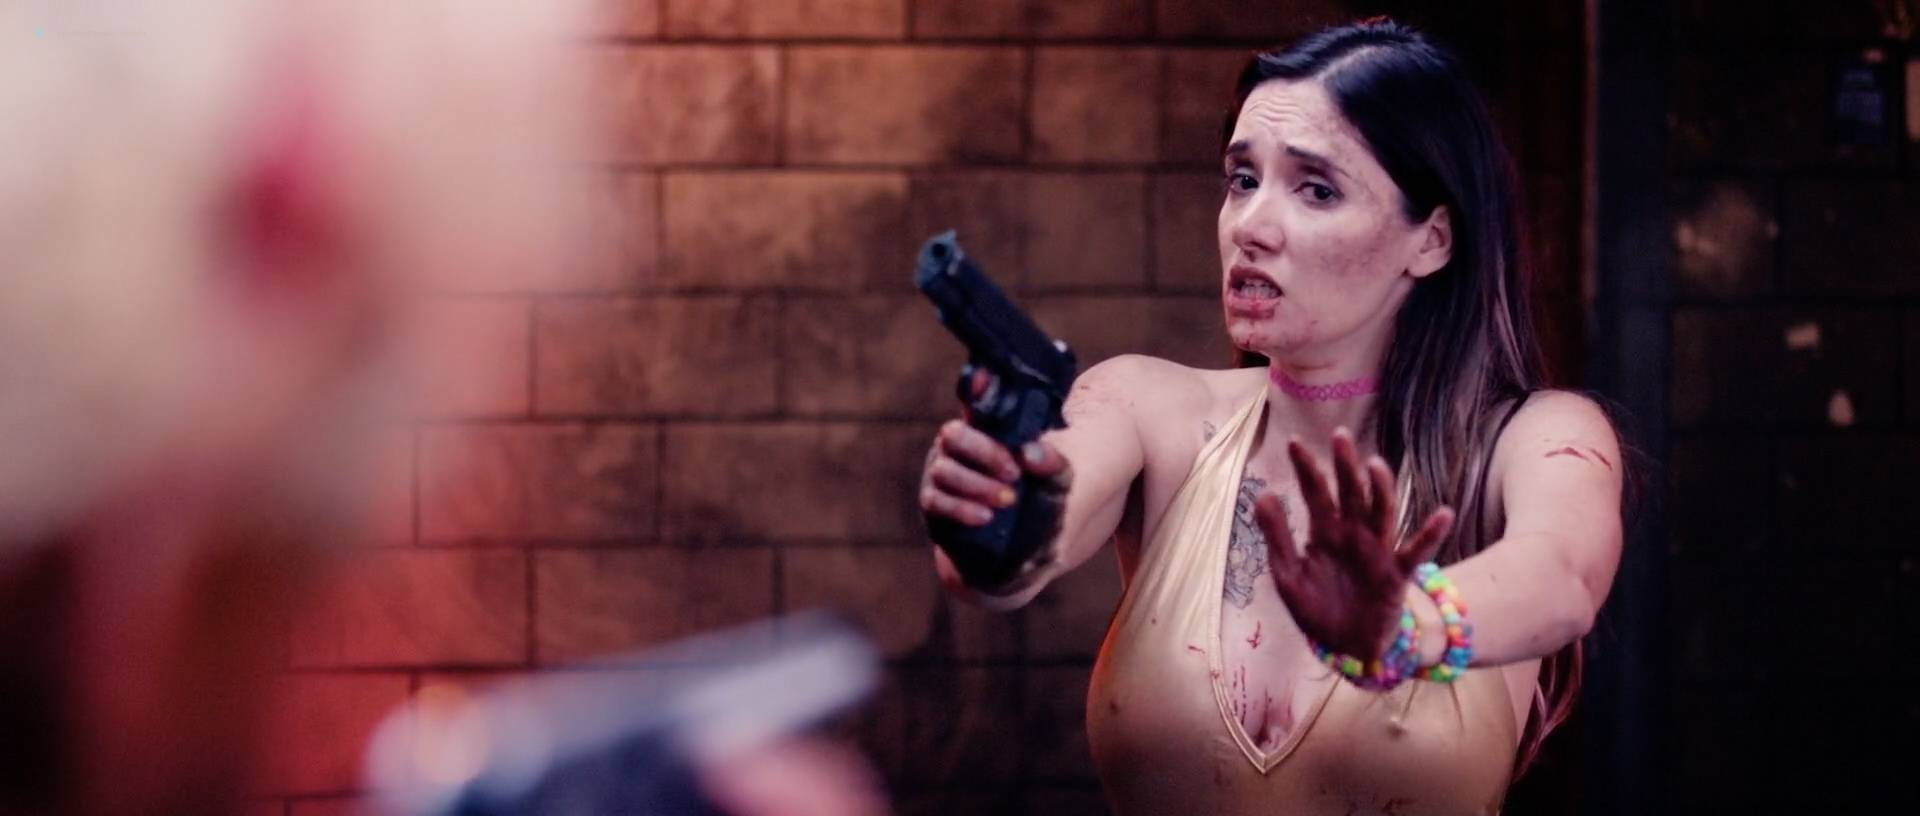 Sara-Malakul-Lane-nude-toples-Kelly-McCart-and-Amanda-Ruth-Ritchie-nude-too-Halloween-Pussy-Trap-Kill-Kill-2017-HD-1080p-Web-010.jpg